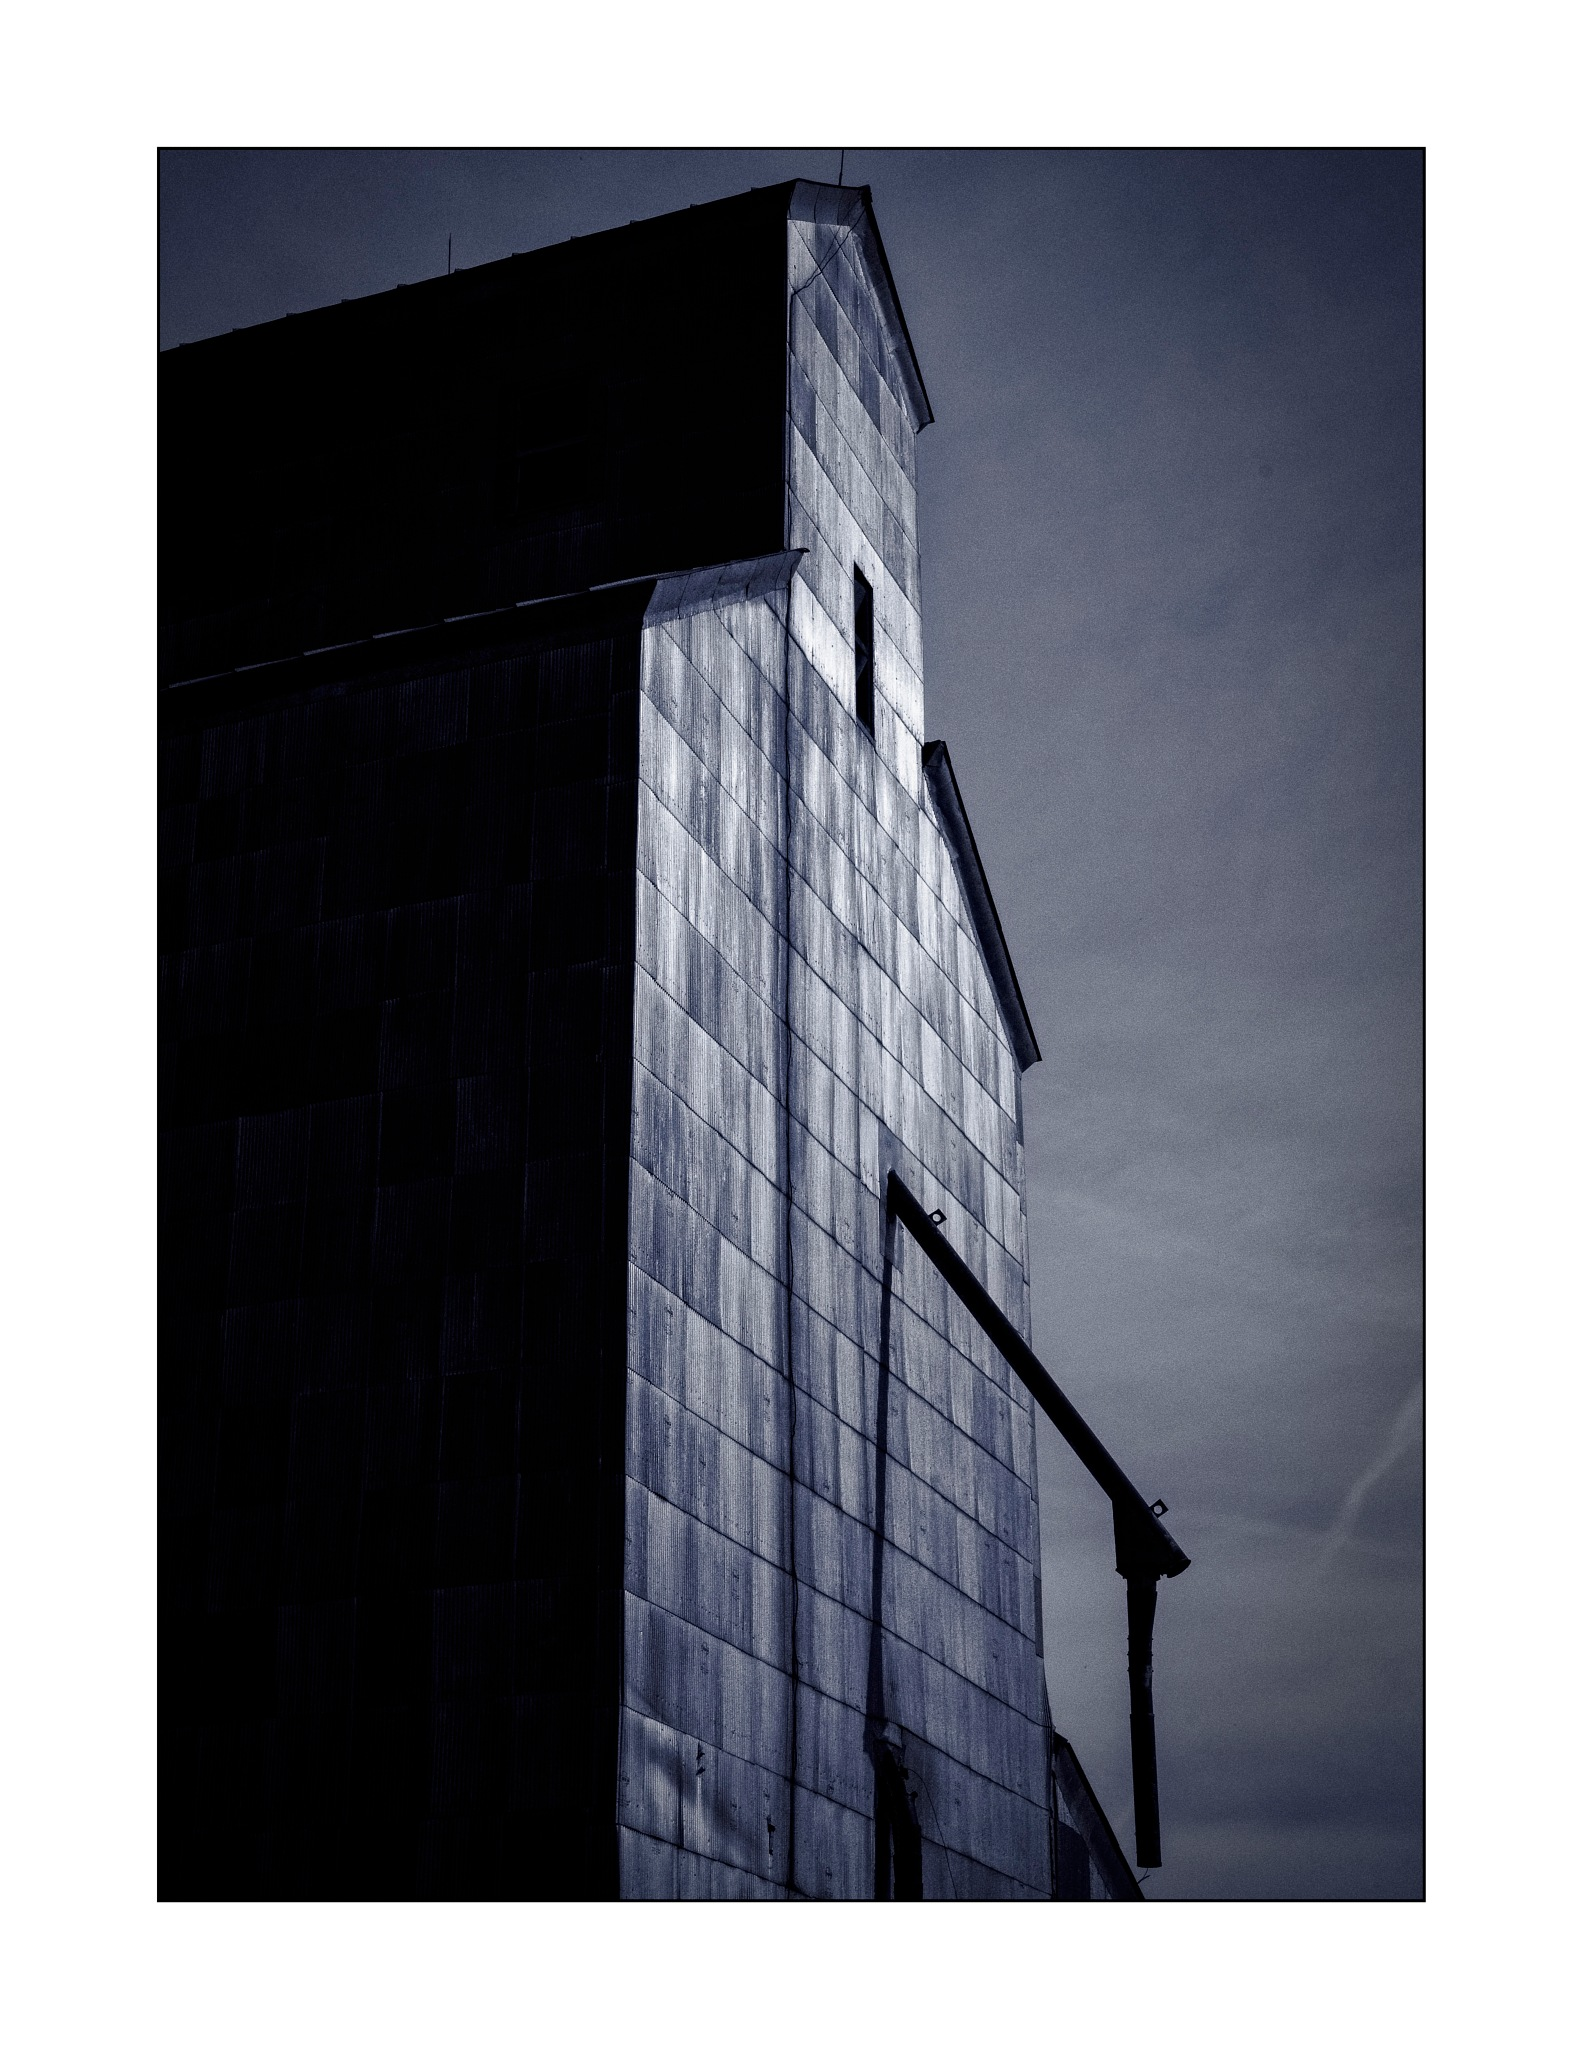 Elevator profile by jhulton